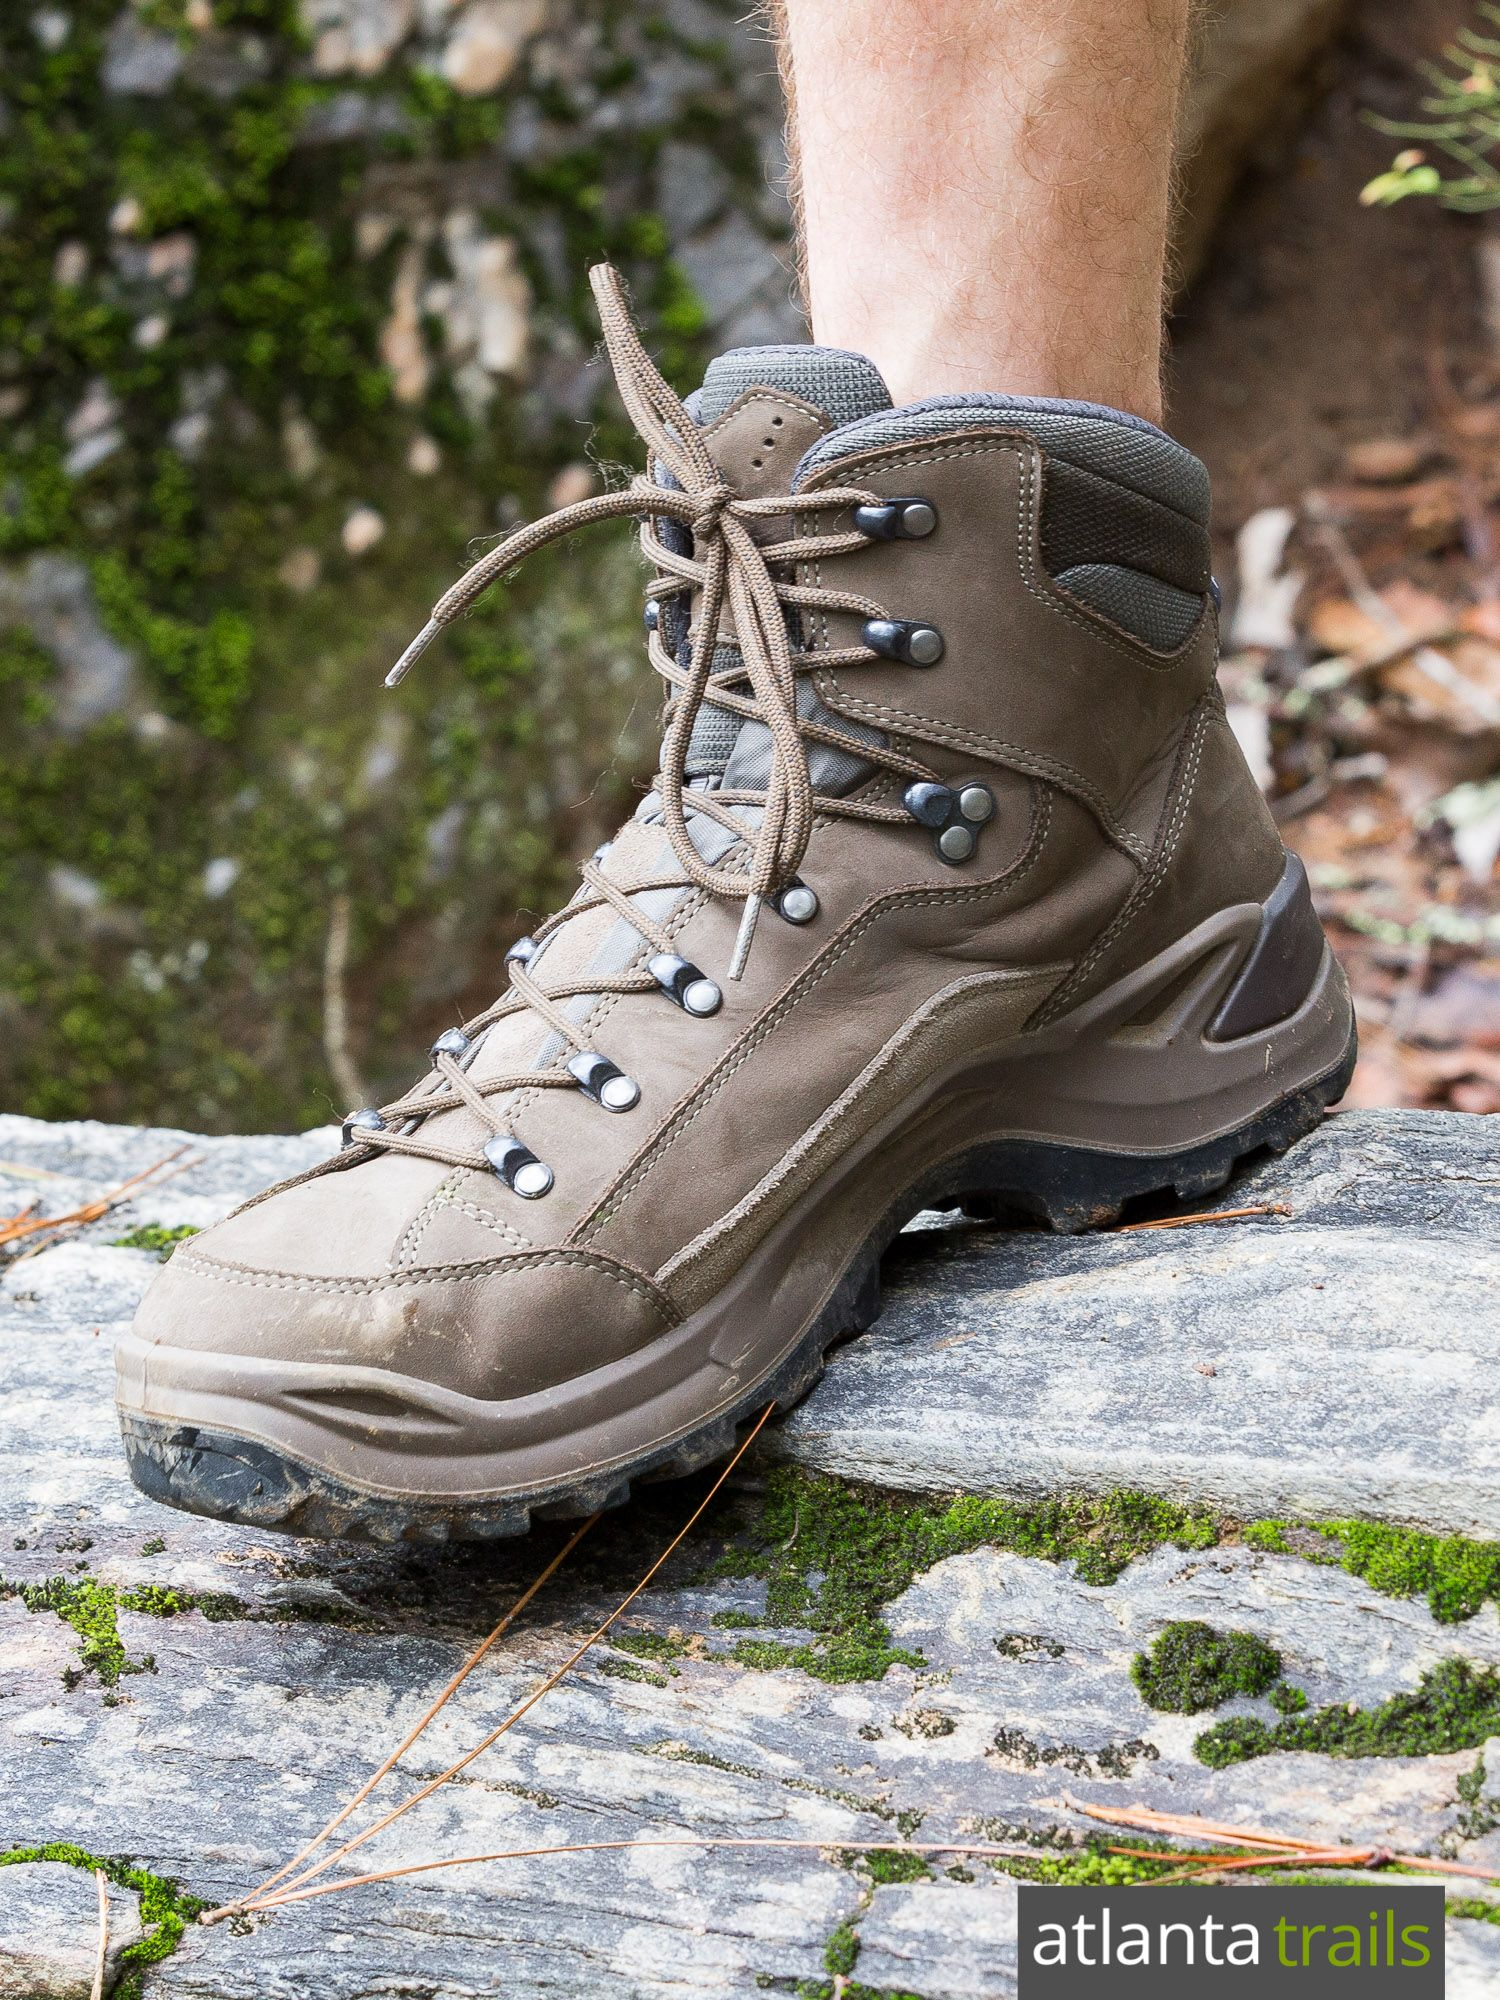 Lowa Renegade GTX Mid hiking boot review LOWA